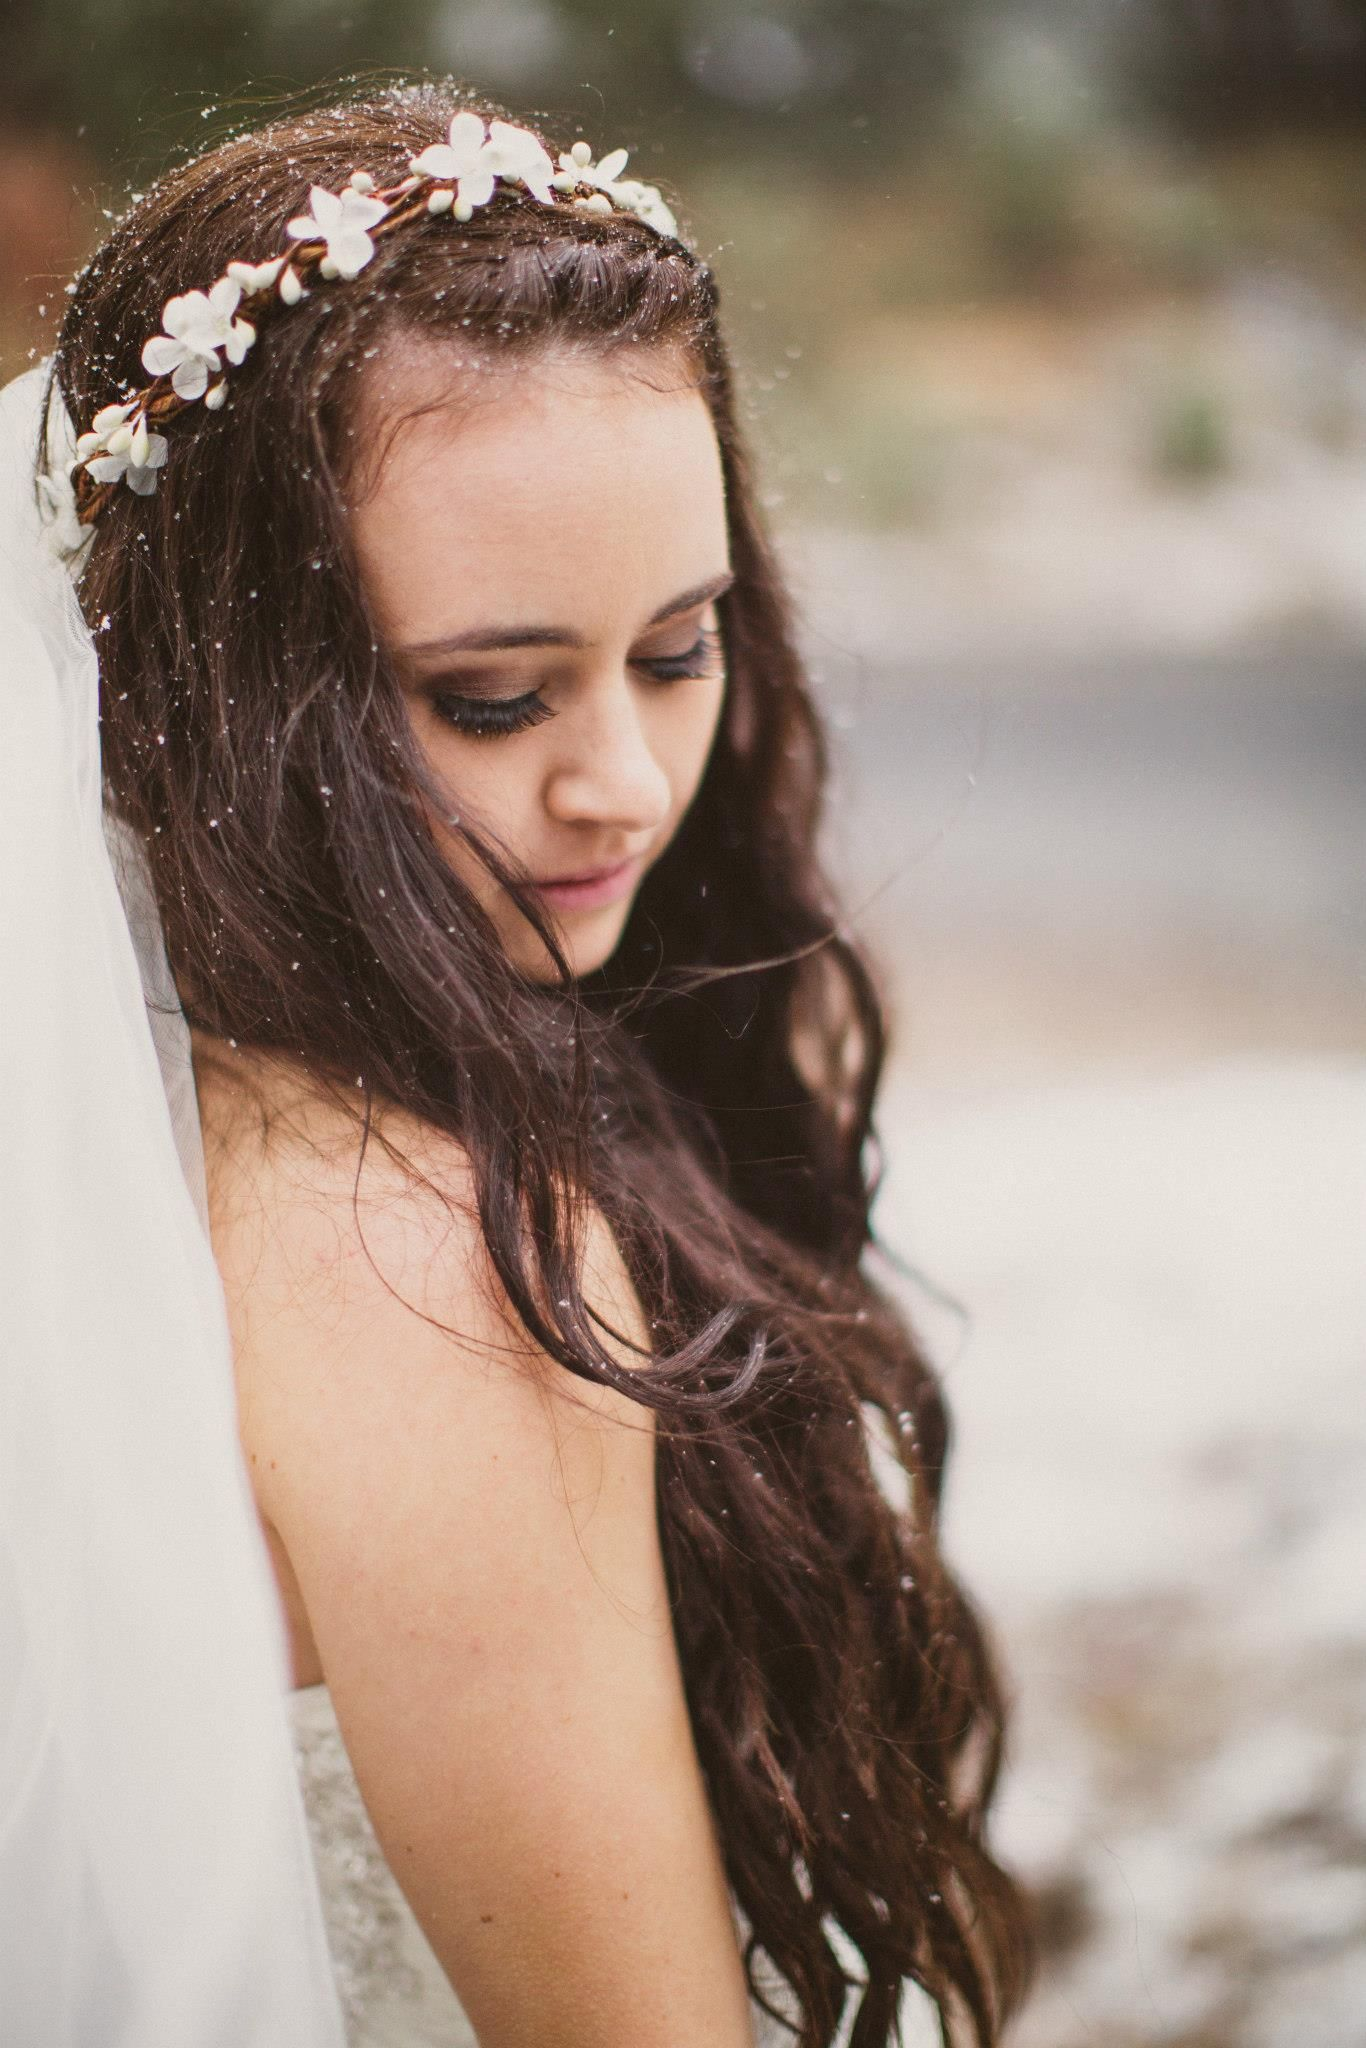 Bridal flower headband crown troue pinterest bridal flowers bridal flower headband crown izmirmasajfo Gallery